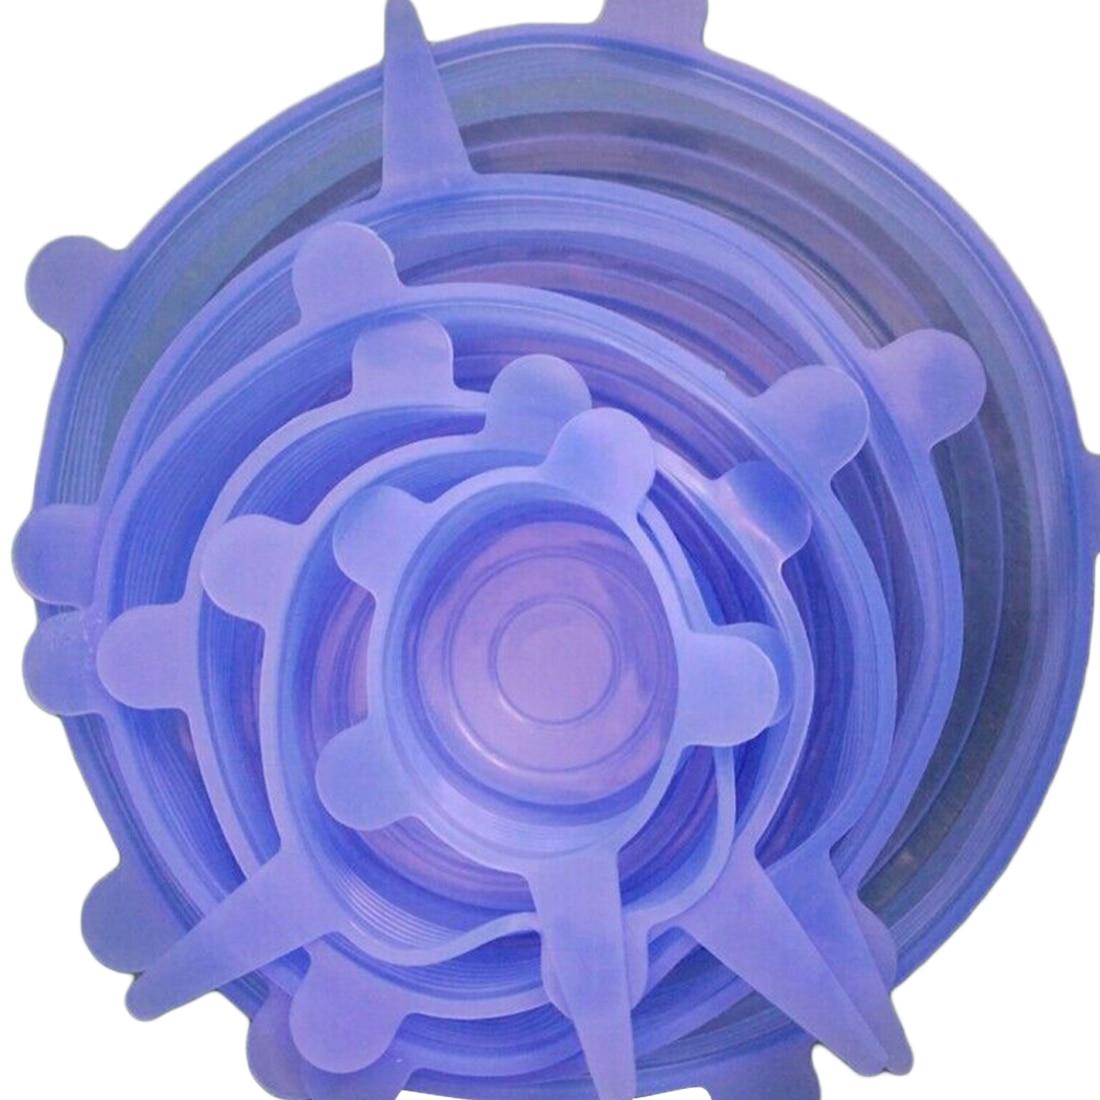 Lid-mangkuk Pot Lid-silikon Stretch Lids Silicone Cover Pan Dapur vakum Tudung Sealer Universal Silicone Saran Makanan Bungkus